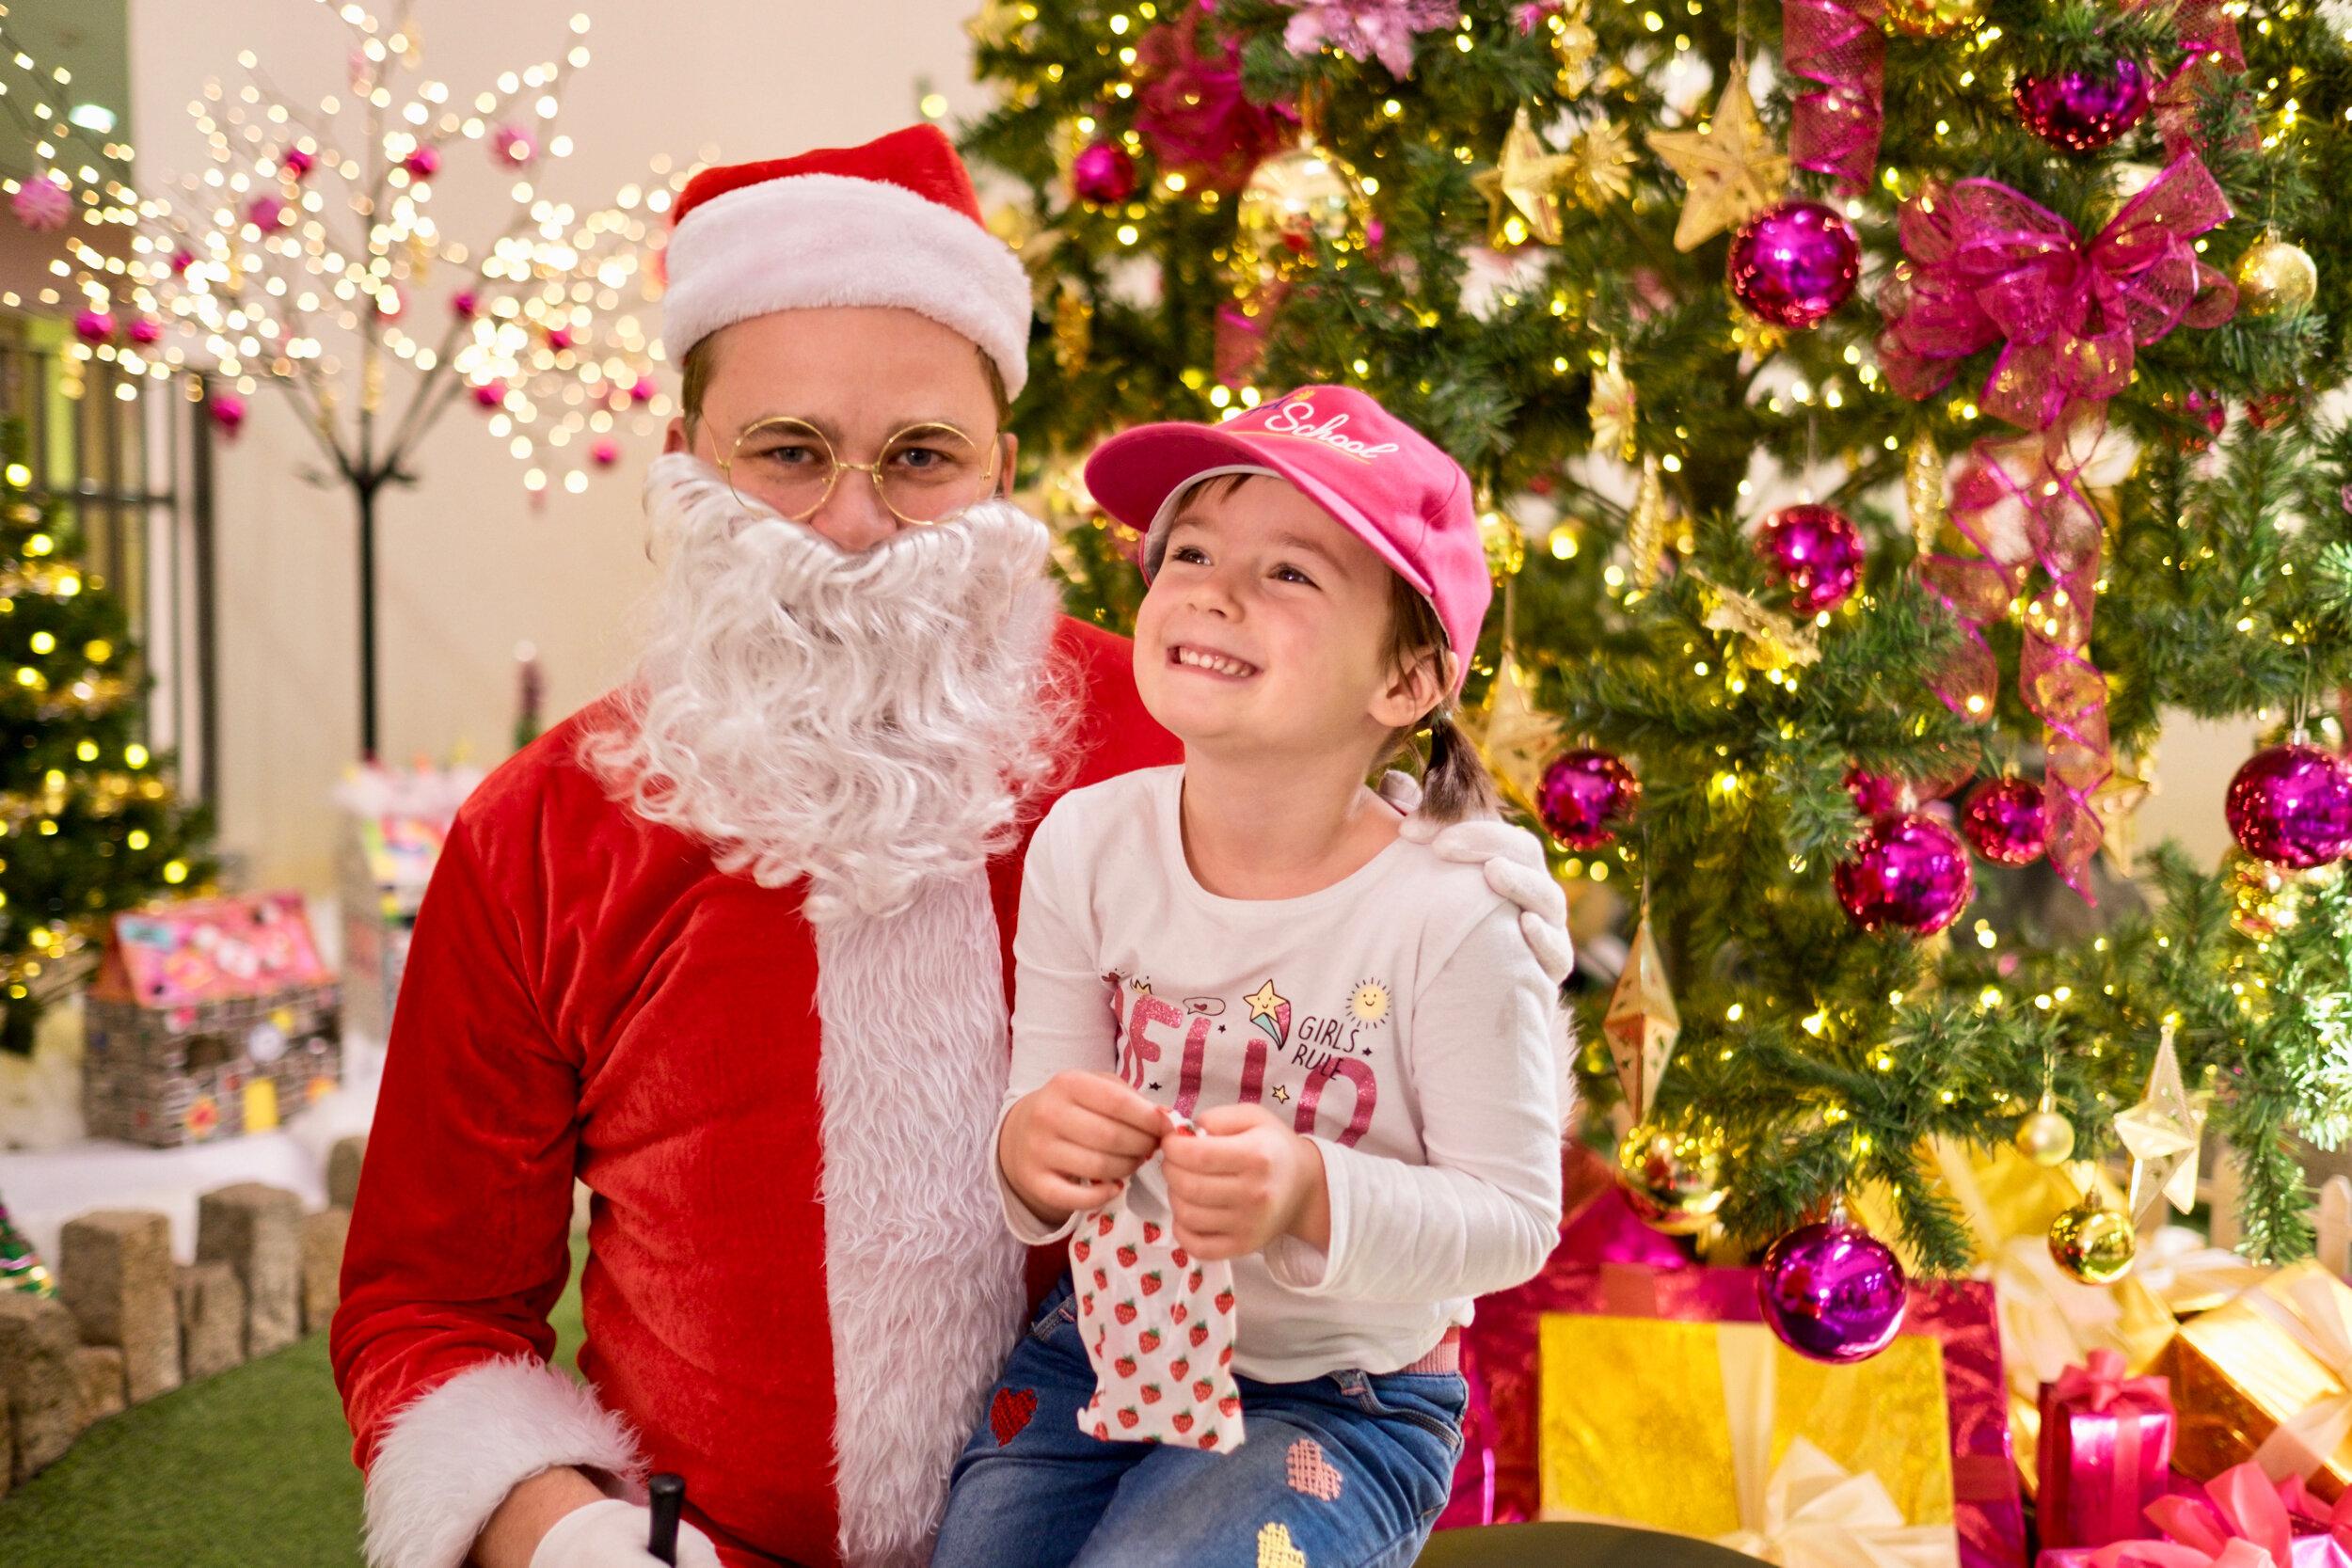 Photoshoot with Santa Clause-717.jpg